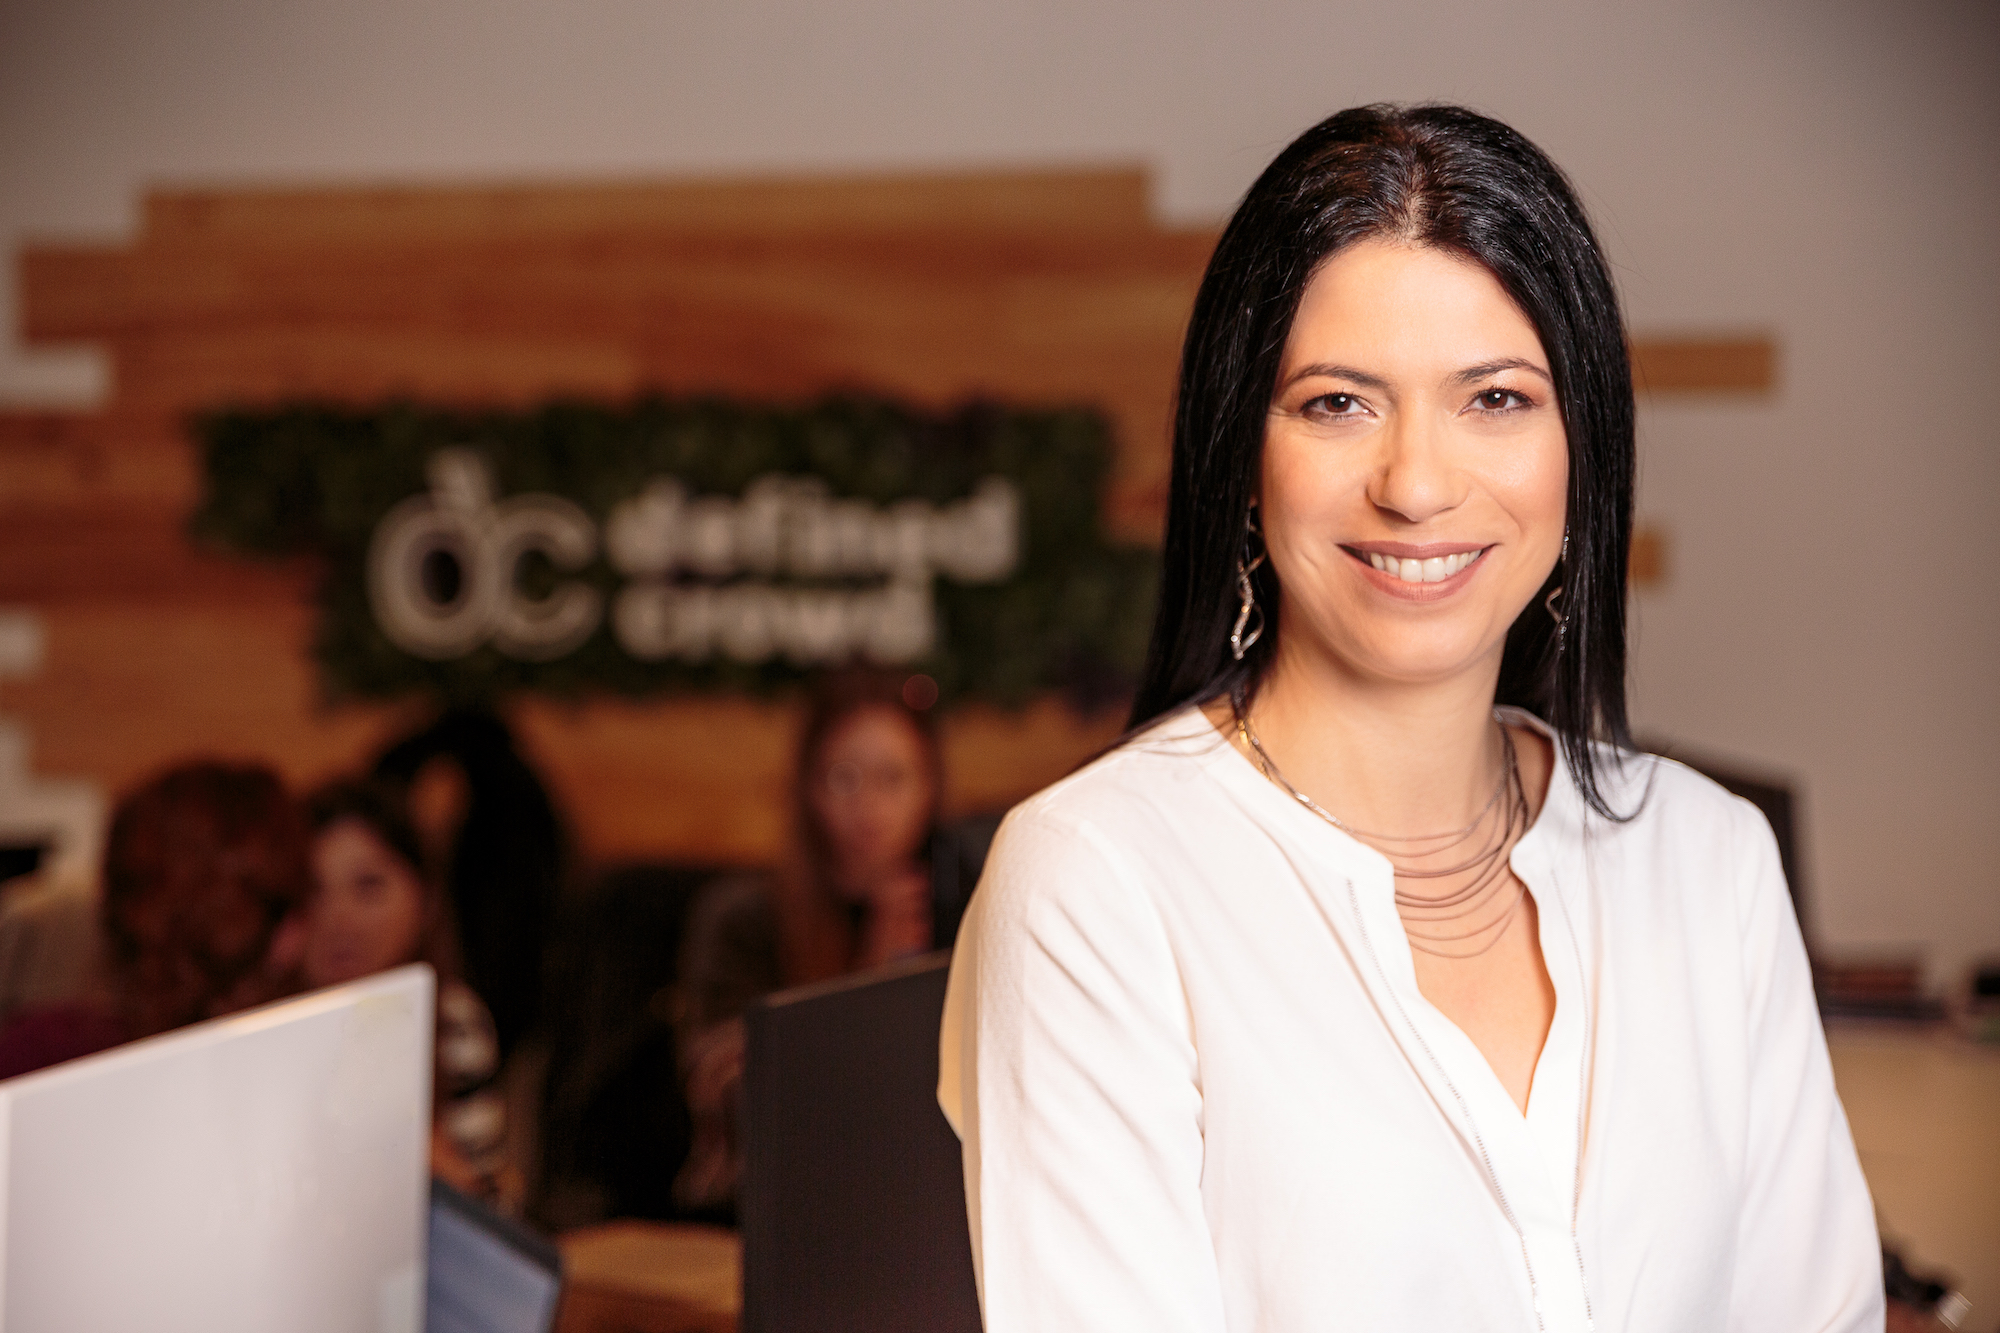 DefinedCrowd CEO Daniela Braga on the future of AI, training data, and women in tech